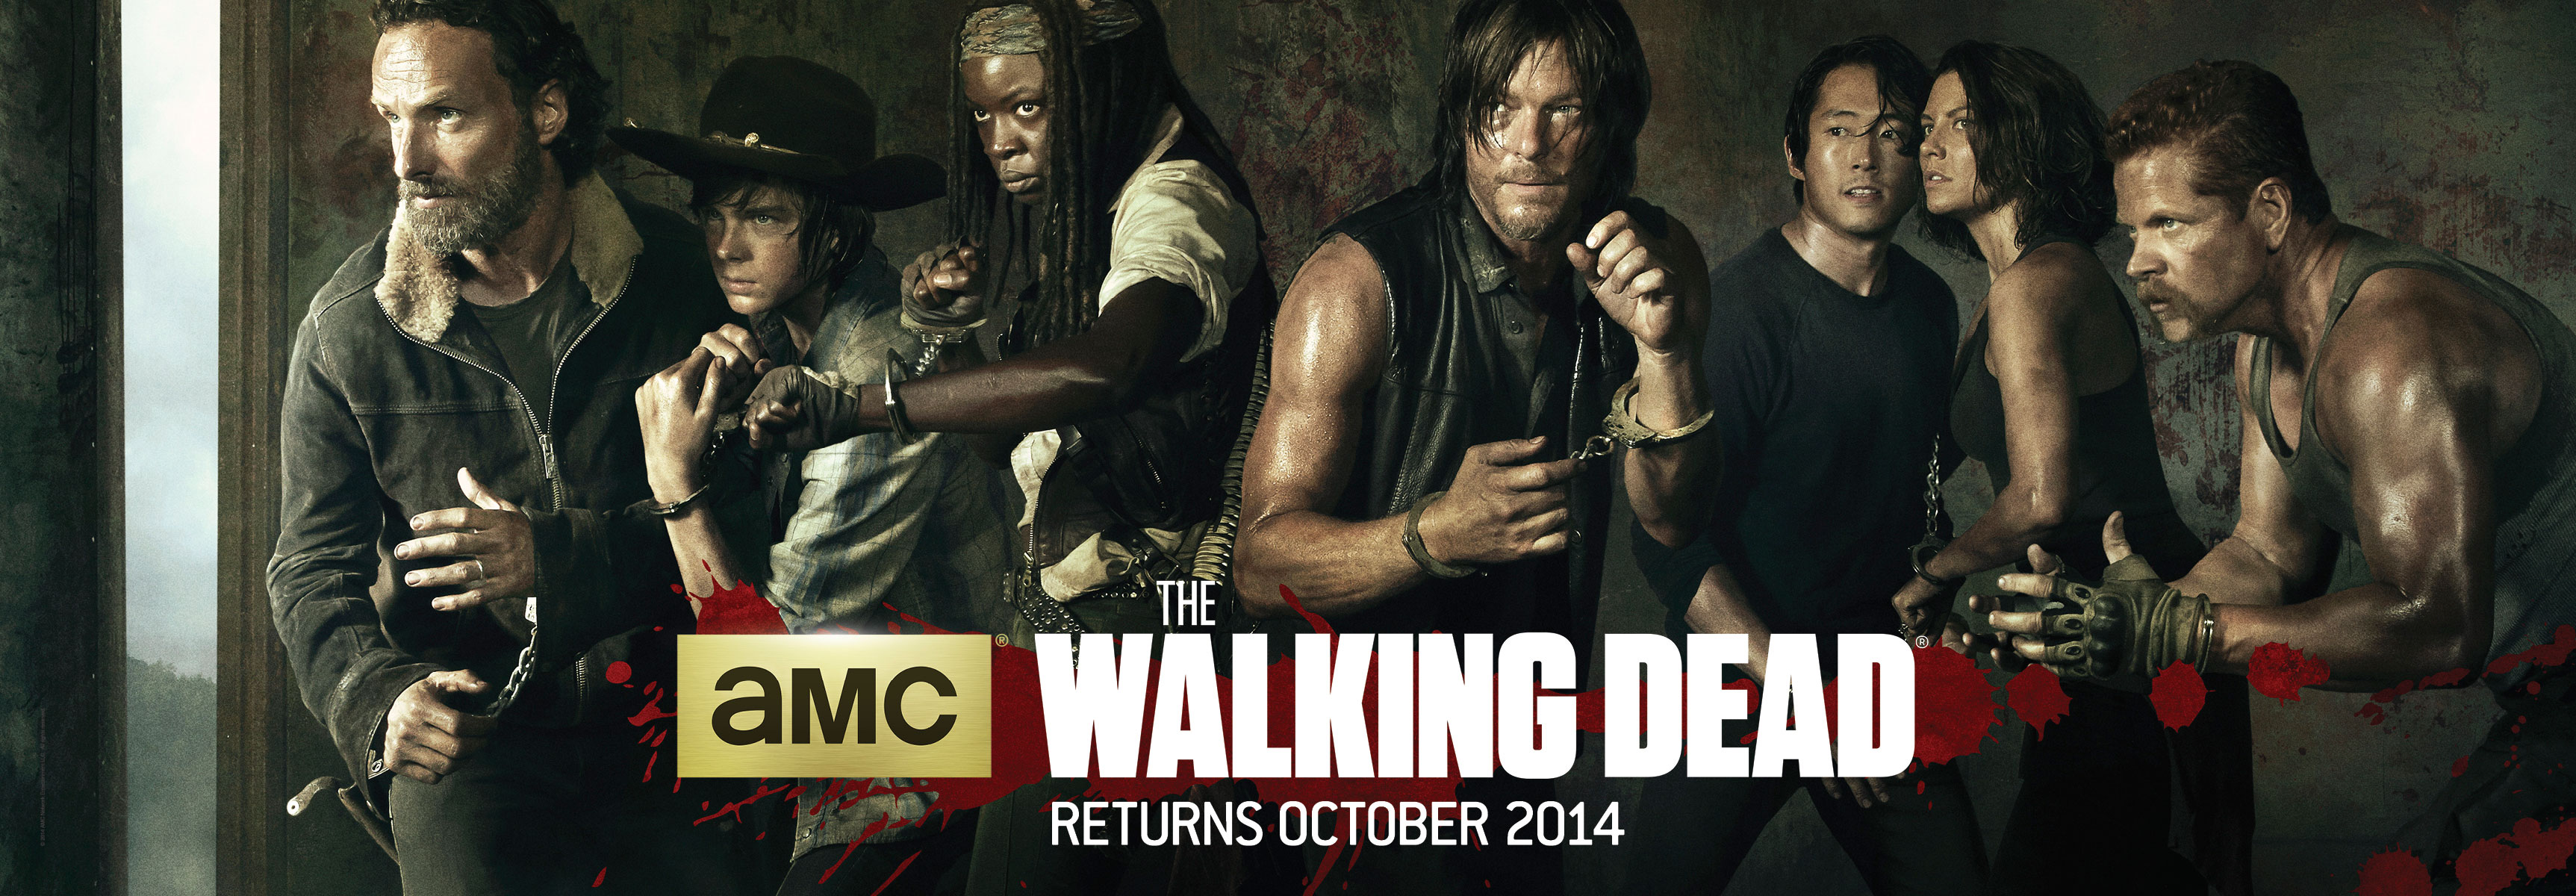 The Walking Dead Season 5 Trailer and Comic-Con Panel Recap Featuring Norman Reedus | Collider